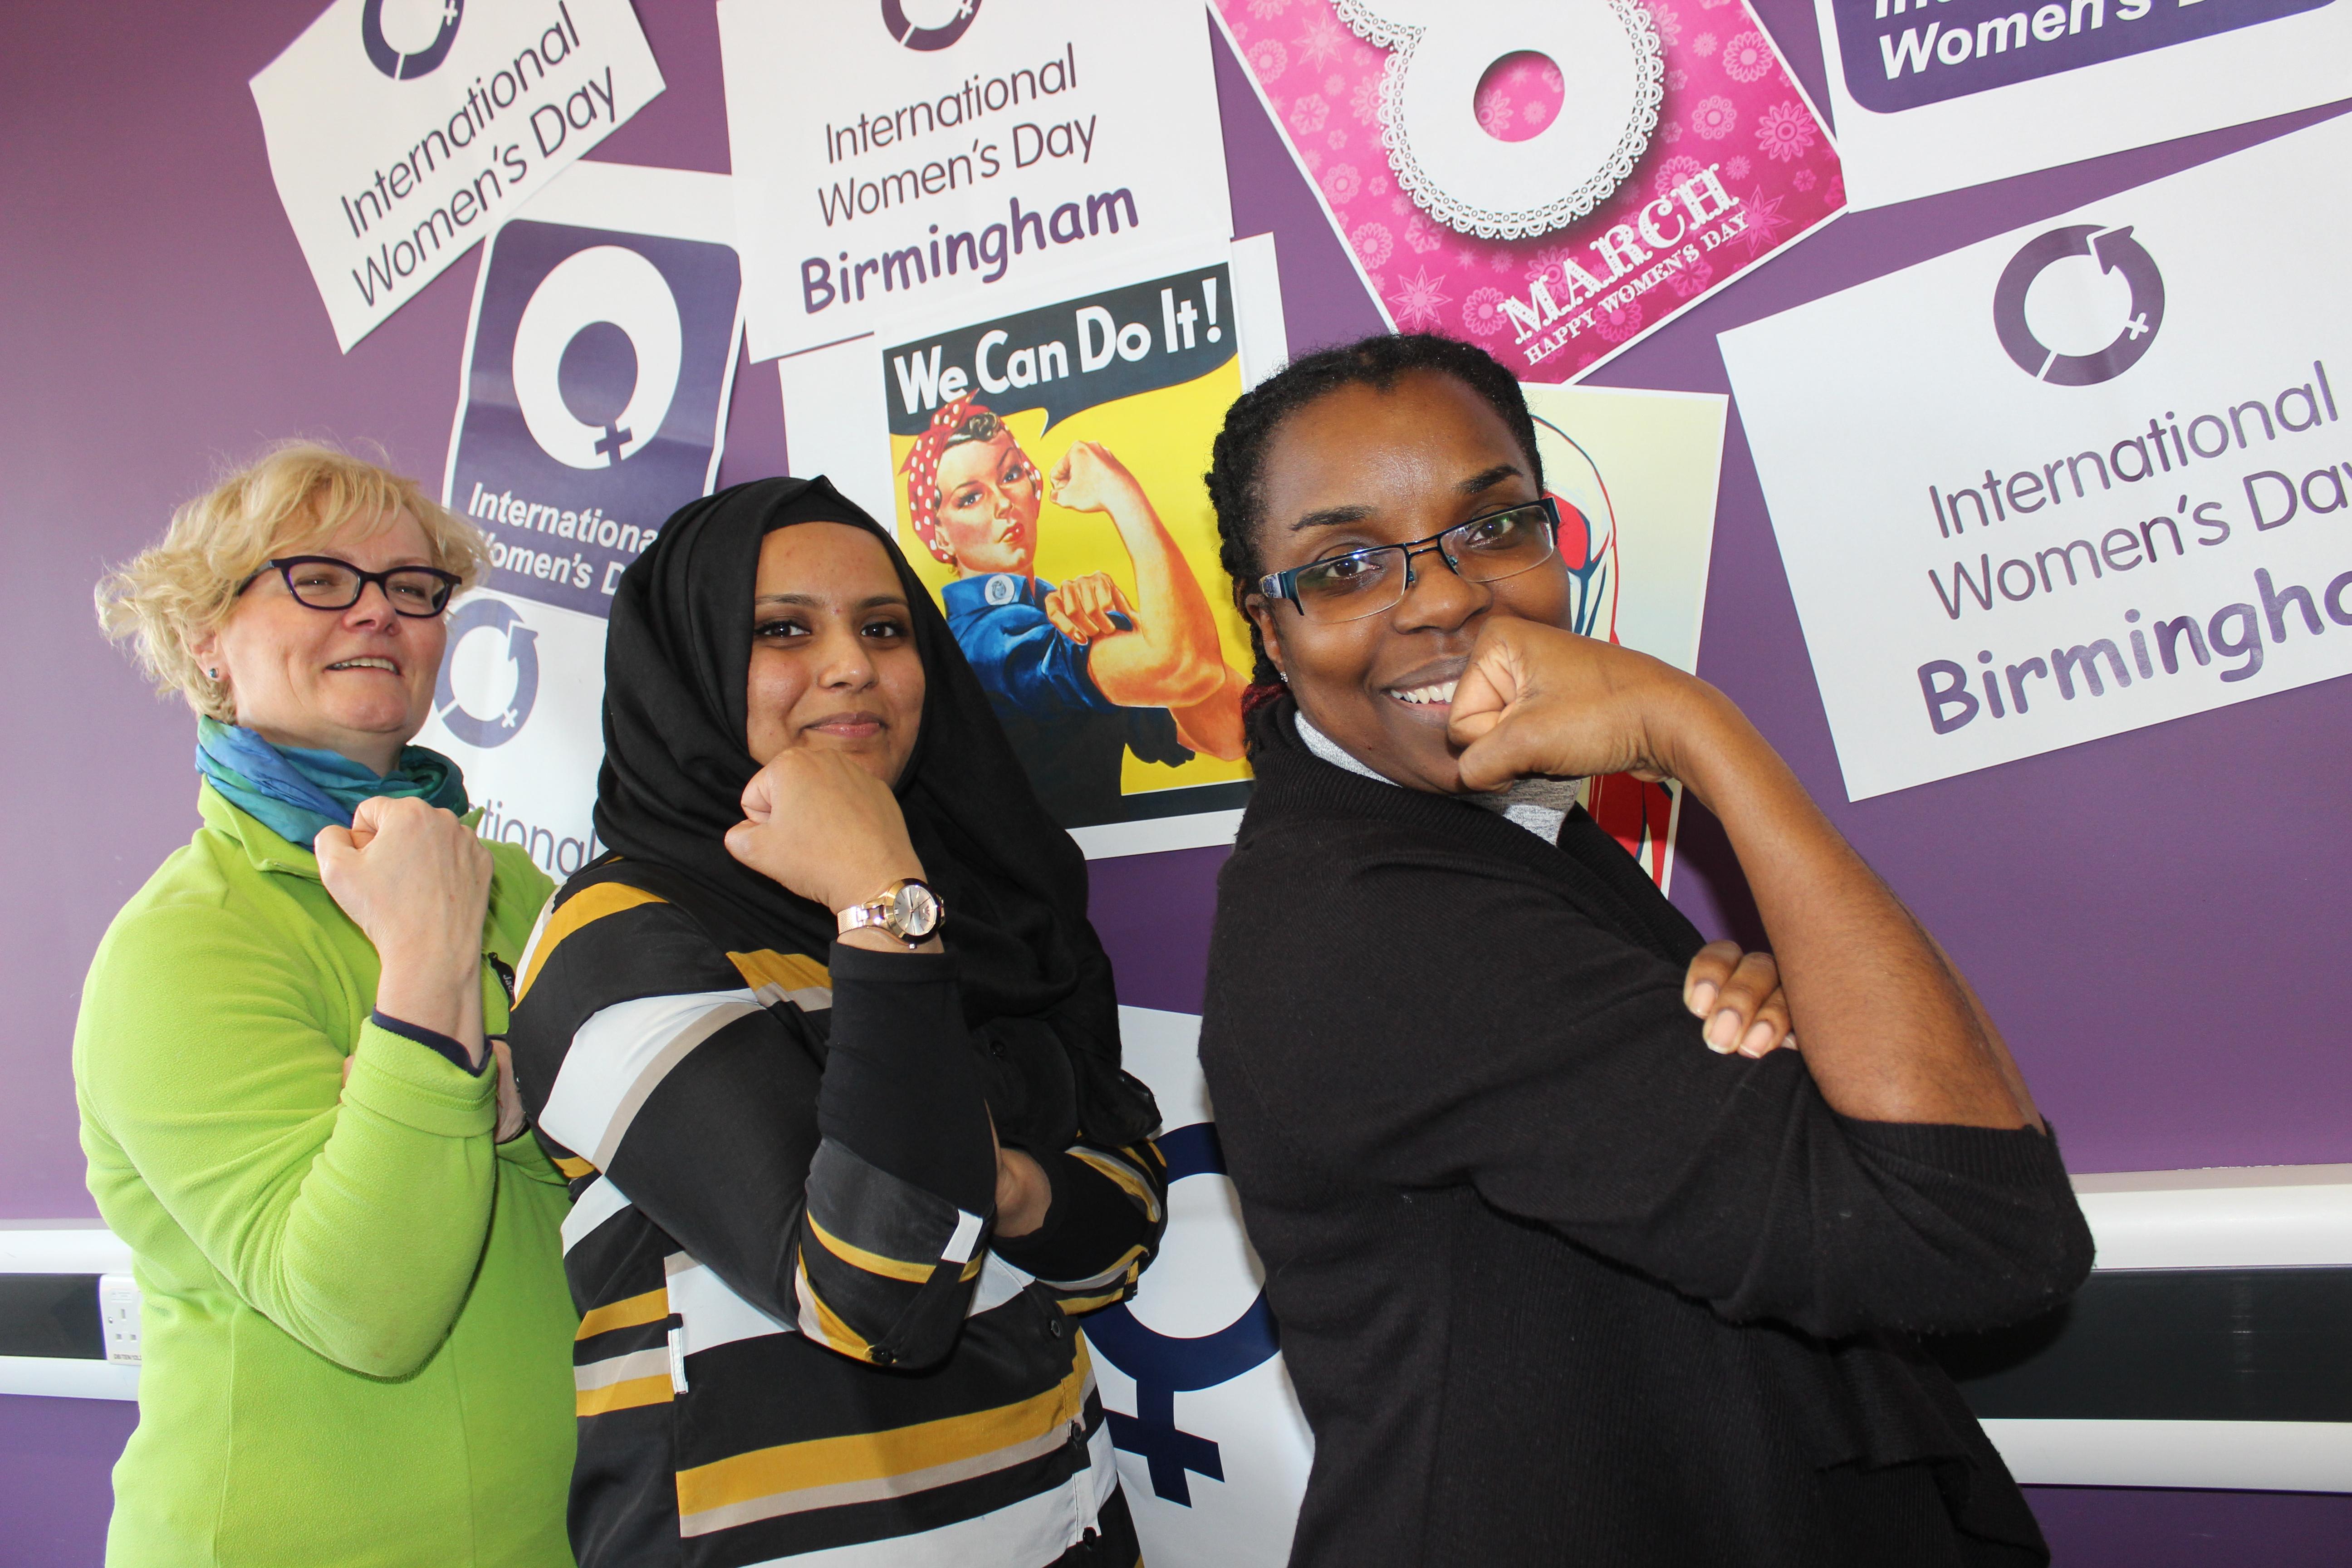 How is Birmingham celebrating International Women's Day?